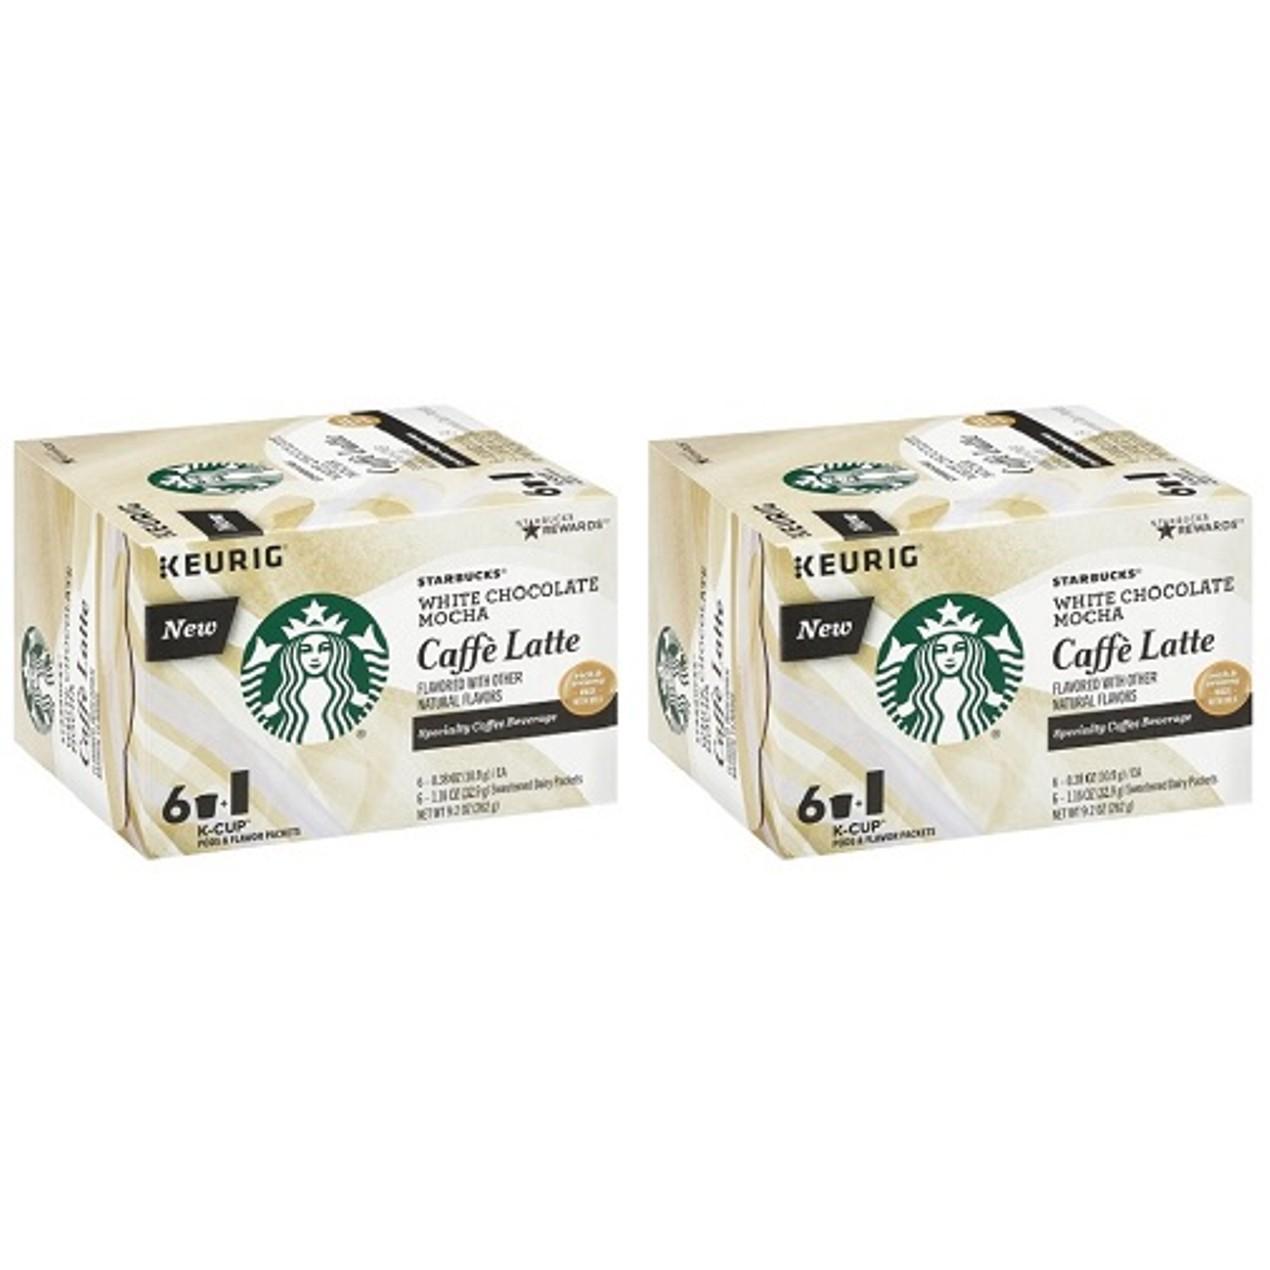 Starbucks White Chocolate Mocha Caffe Latte Keurig K Cups 2